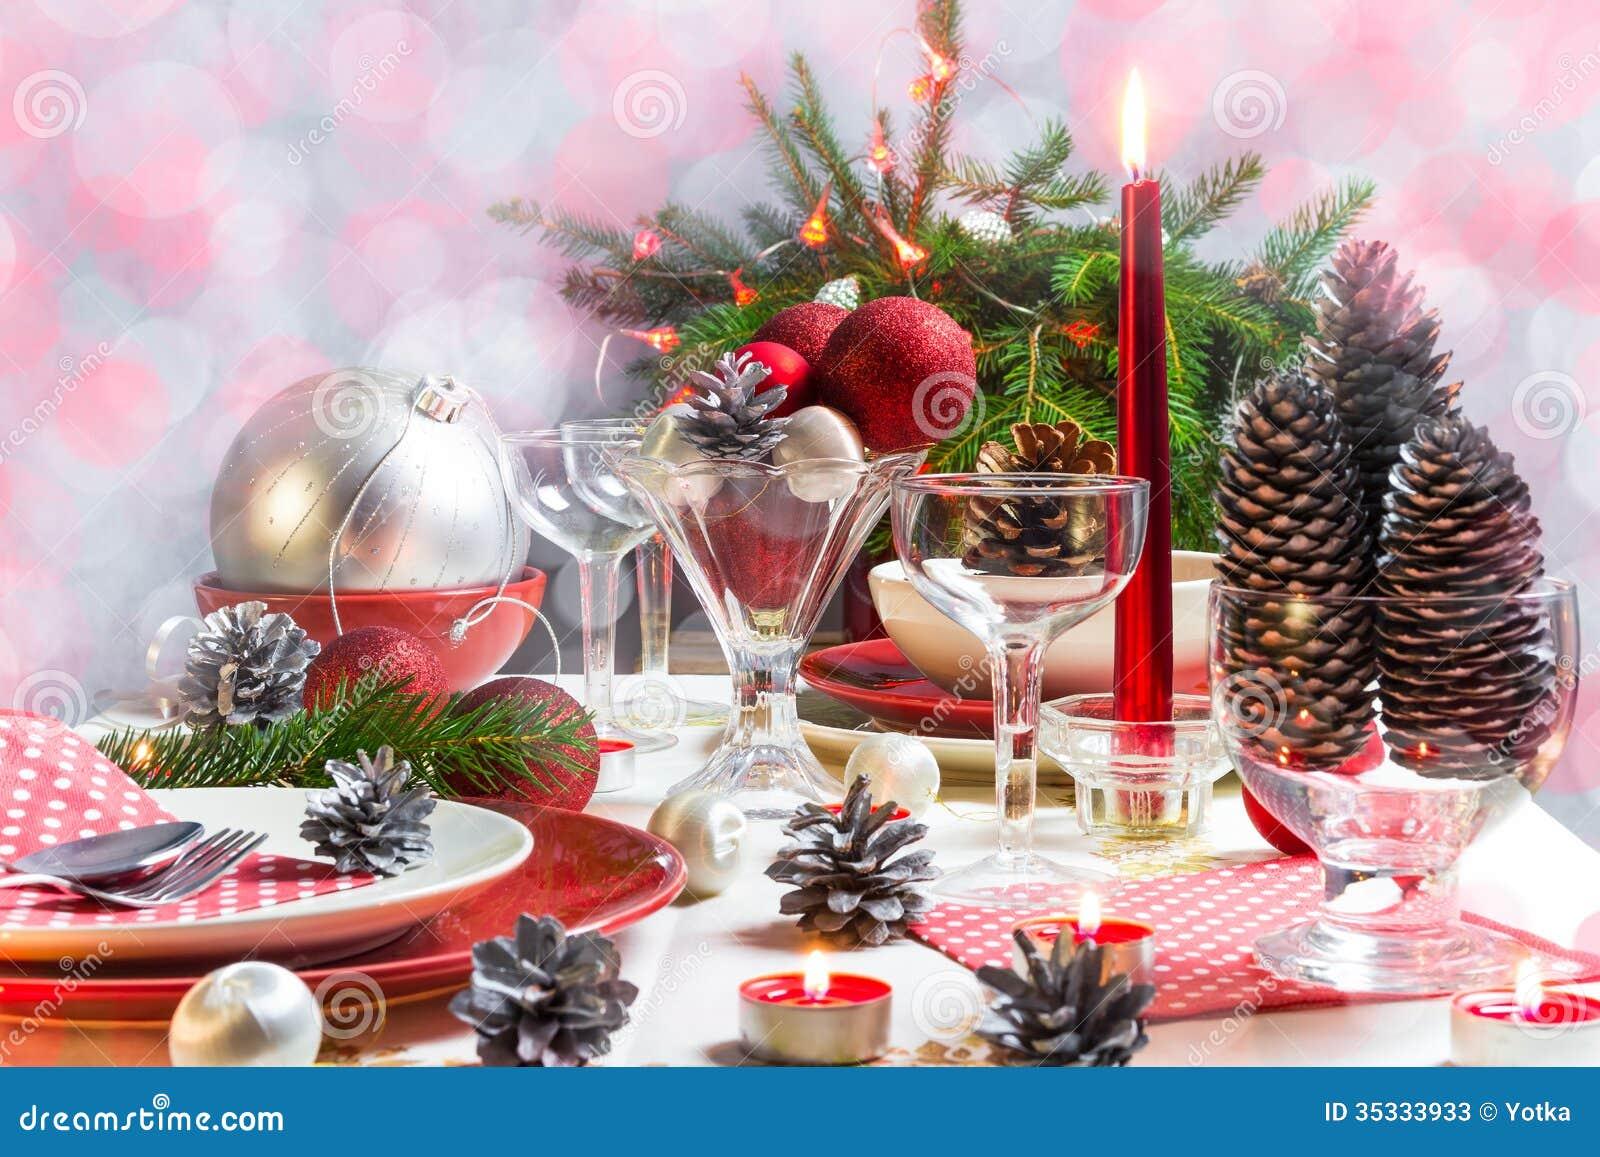 Christmas Xmas Eve Table Setting Supper Stock Photos